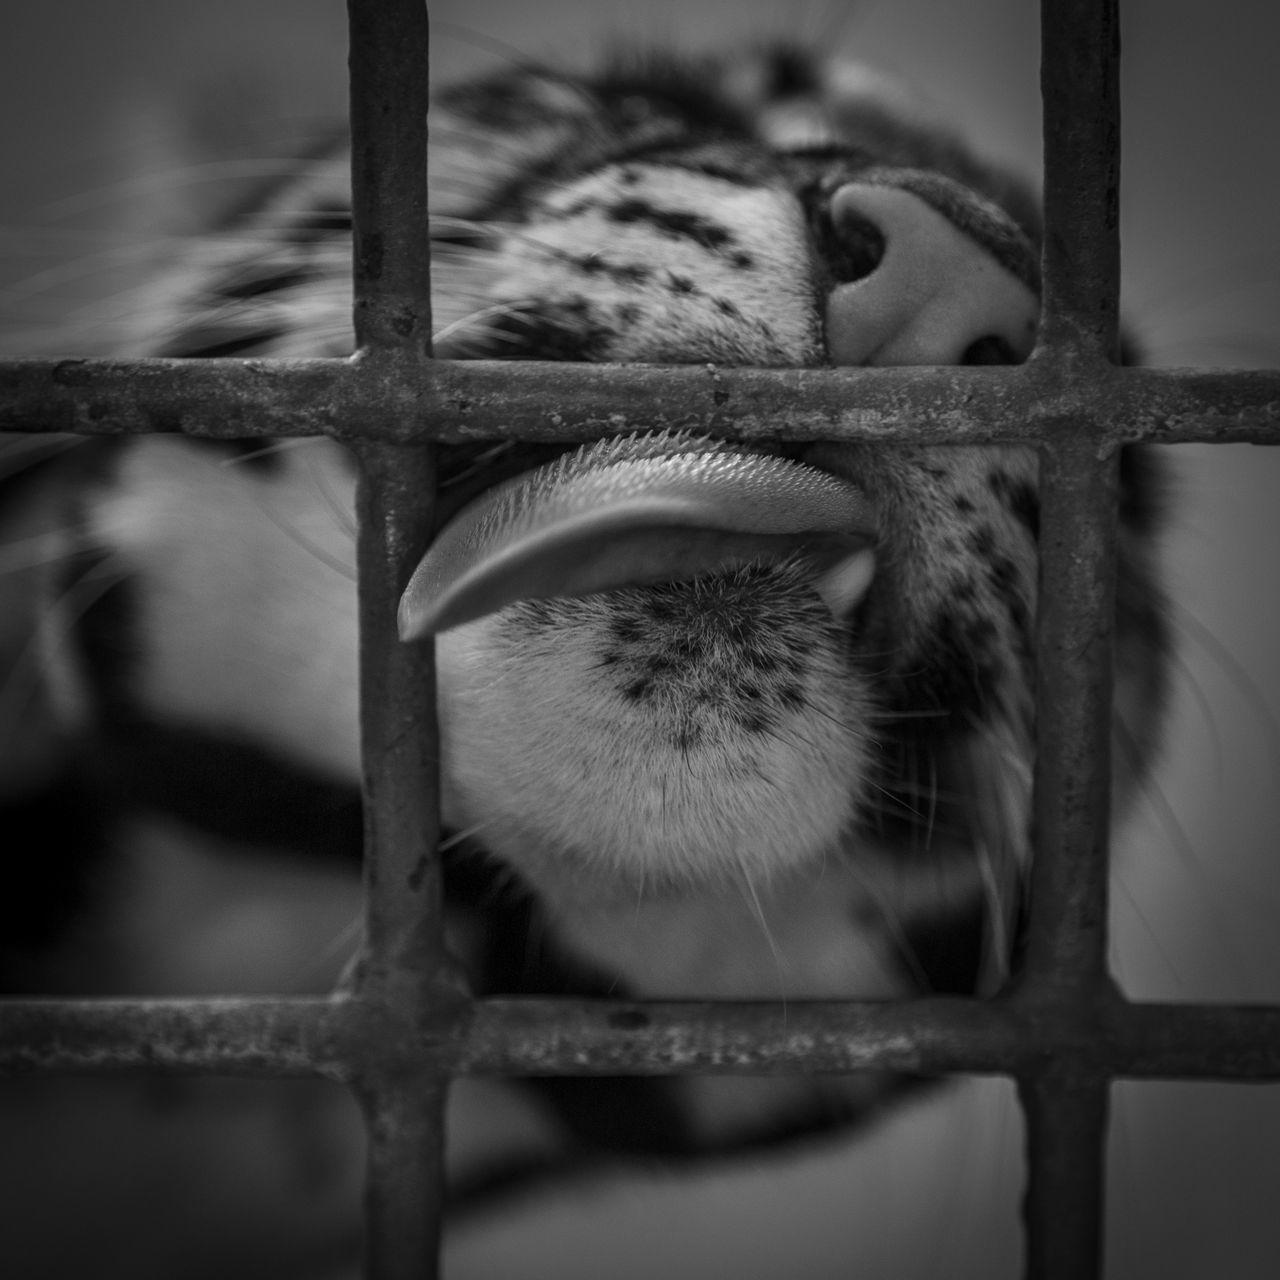 Animal Body Part Animal Themes Cage Close-up One Animal Prickly Prickly Tongue Tiger Tongue Tongue Out